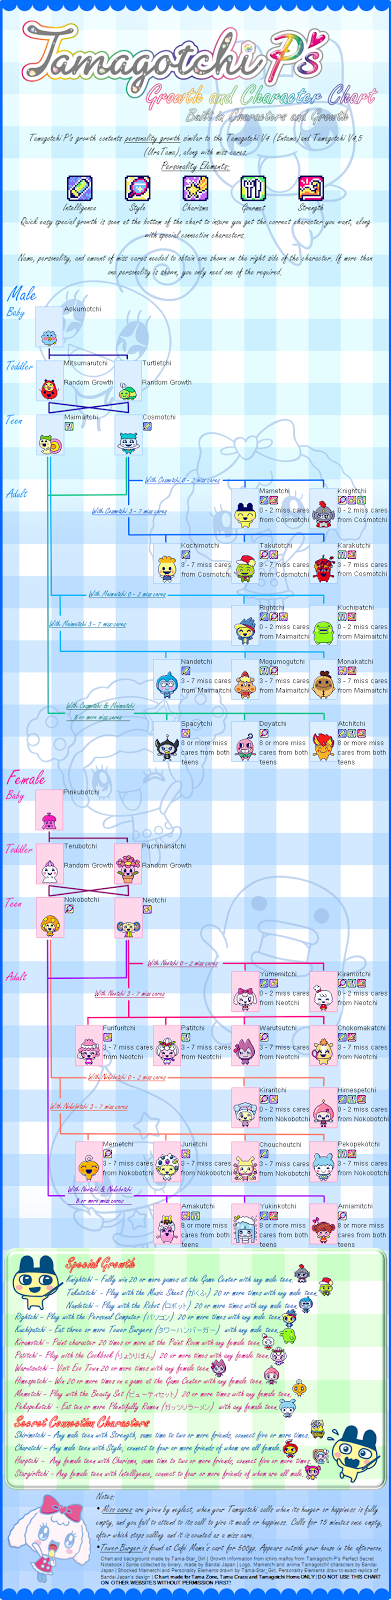 Tamagotchi Growth Charts Juveique27